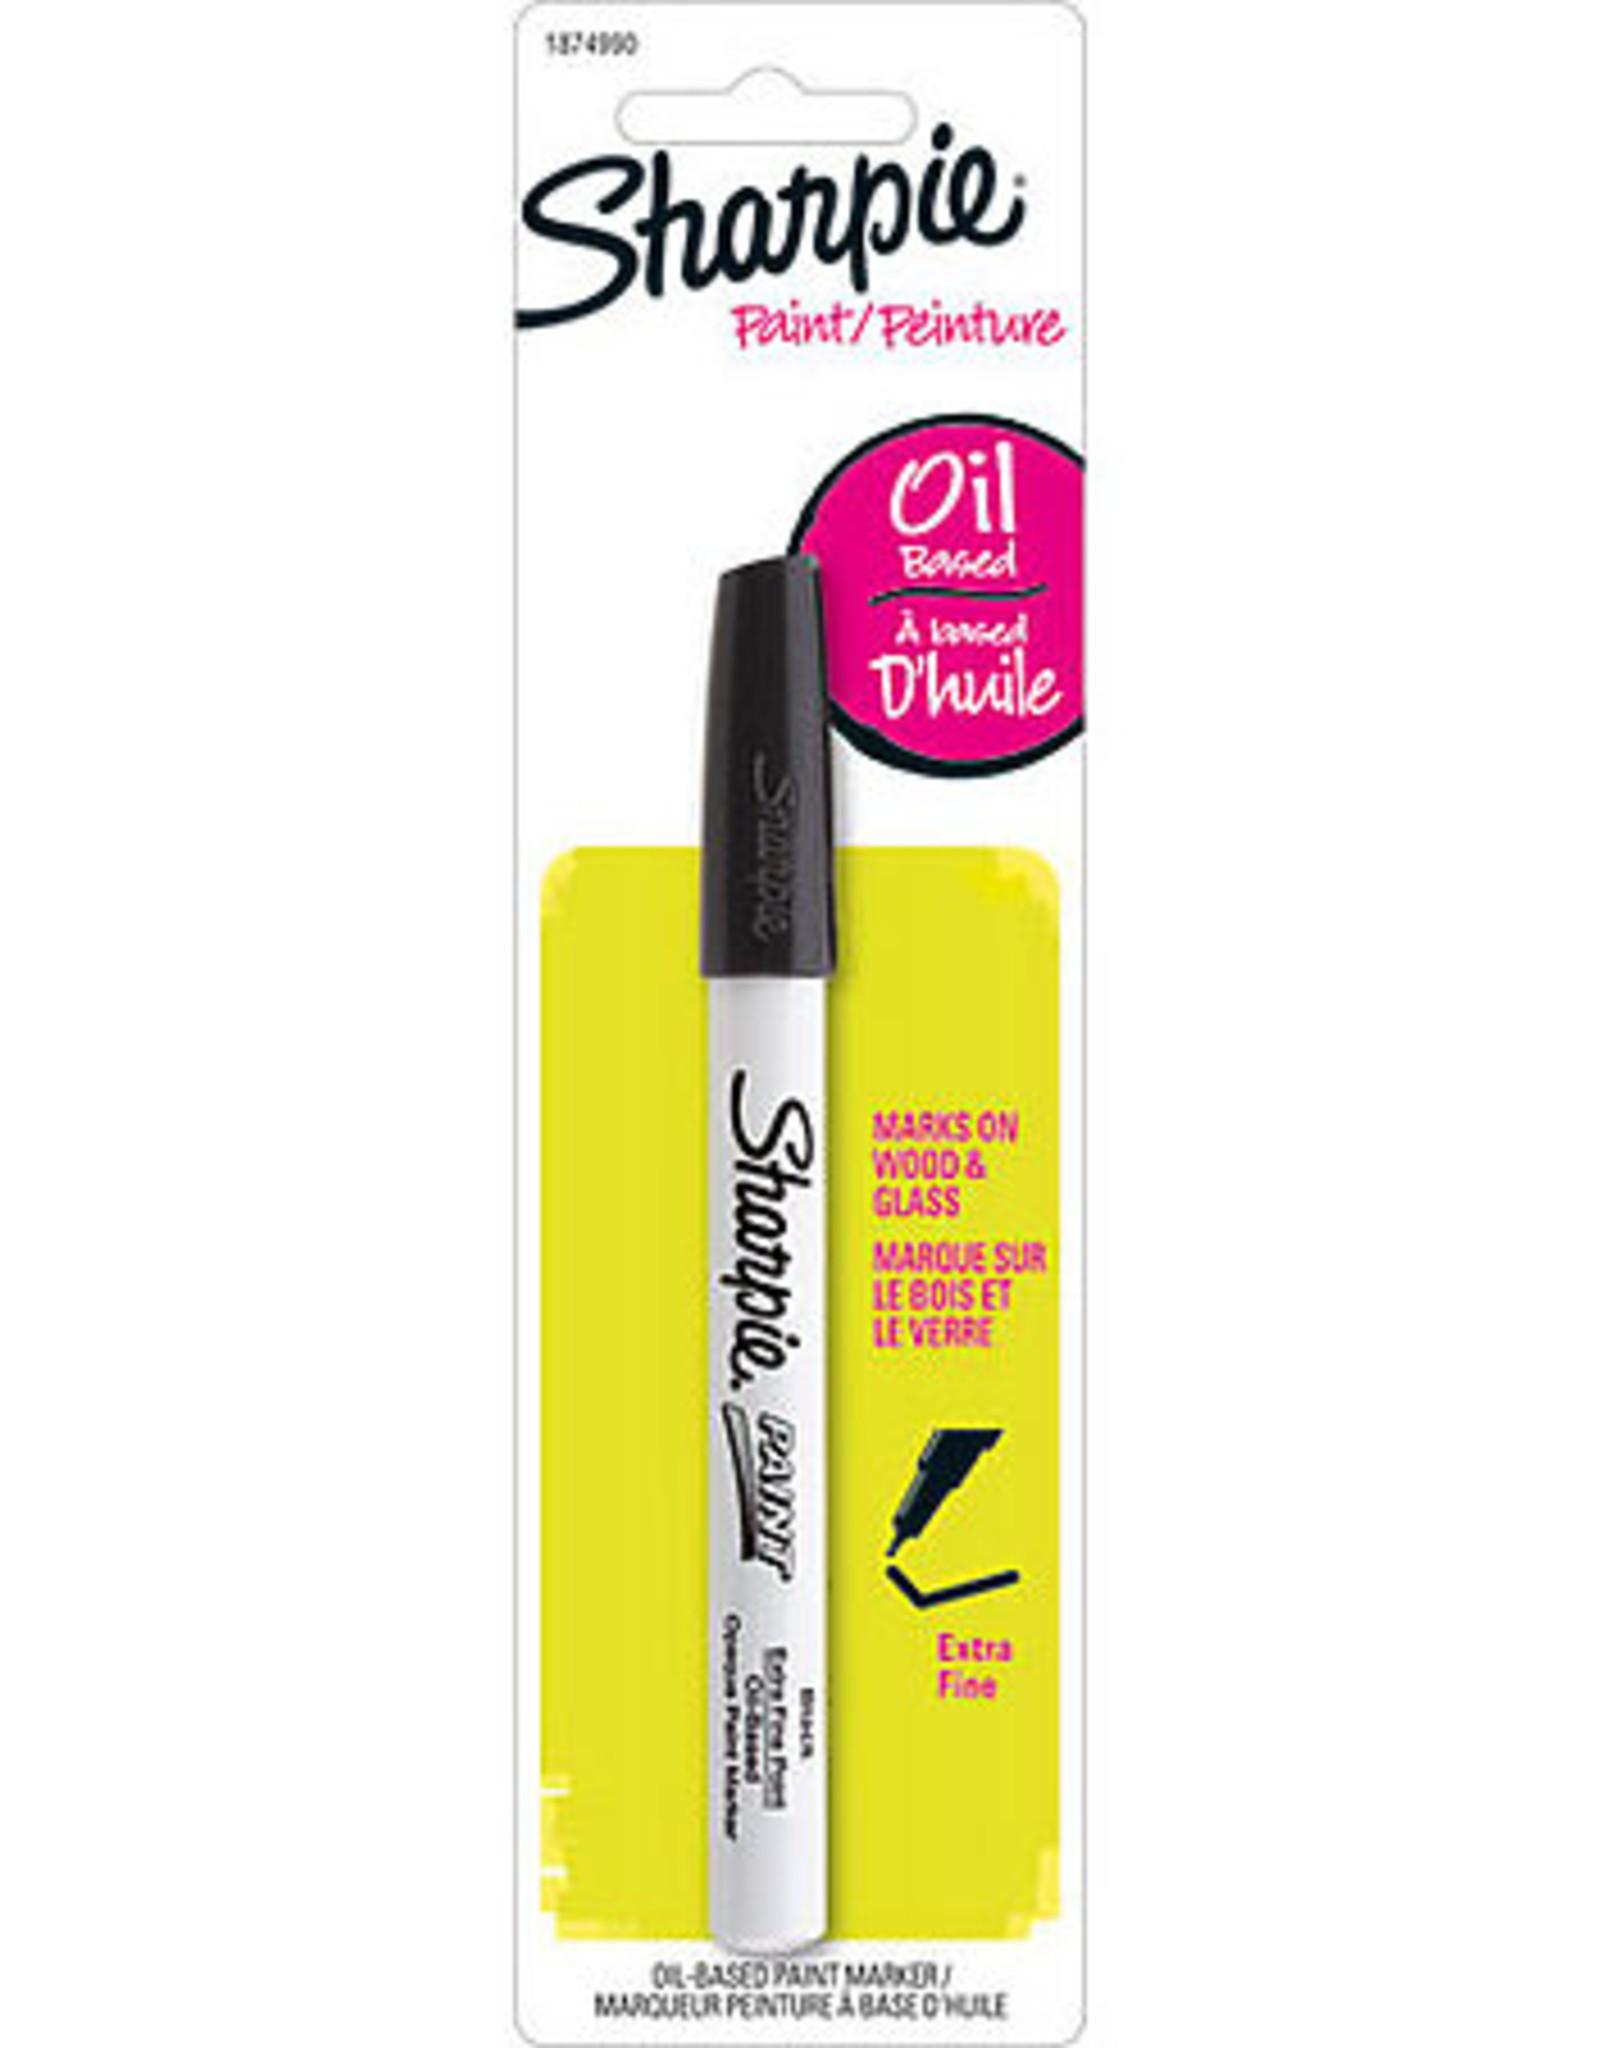 Sharpie Sharpie Oil Paint Markers